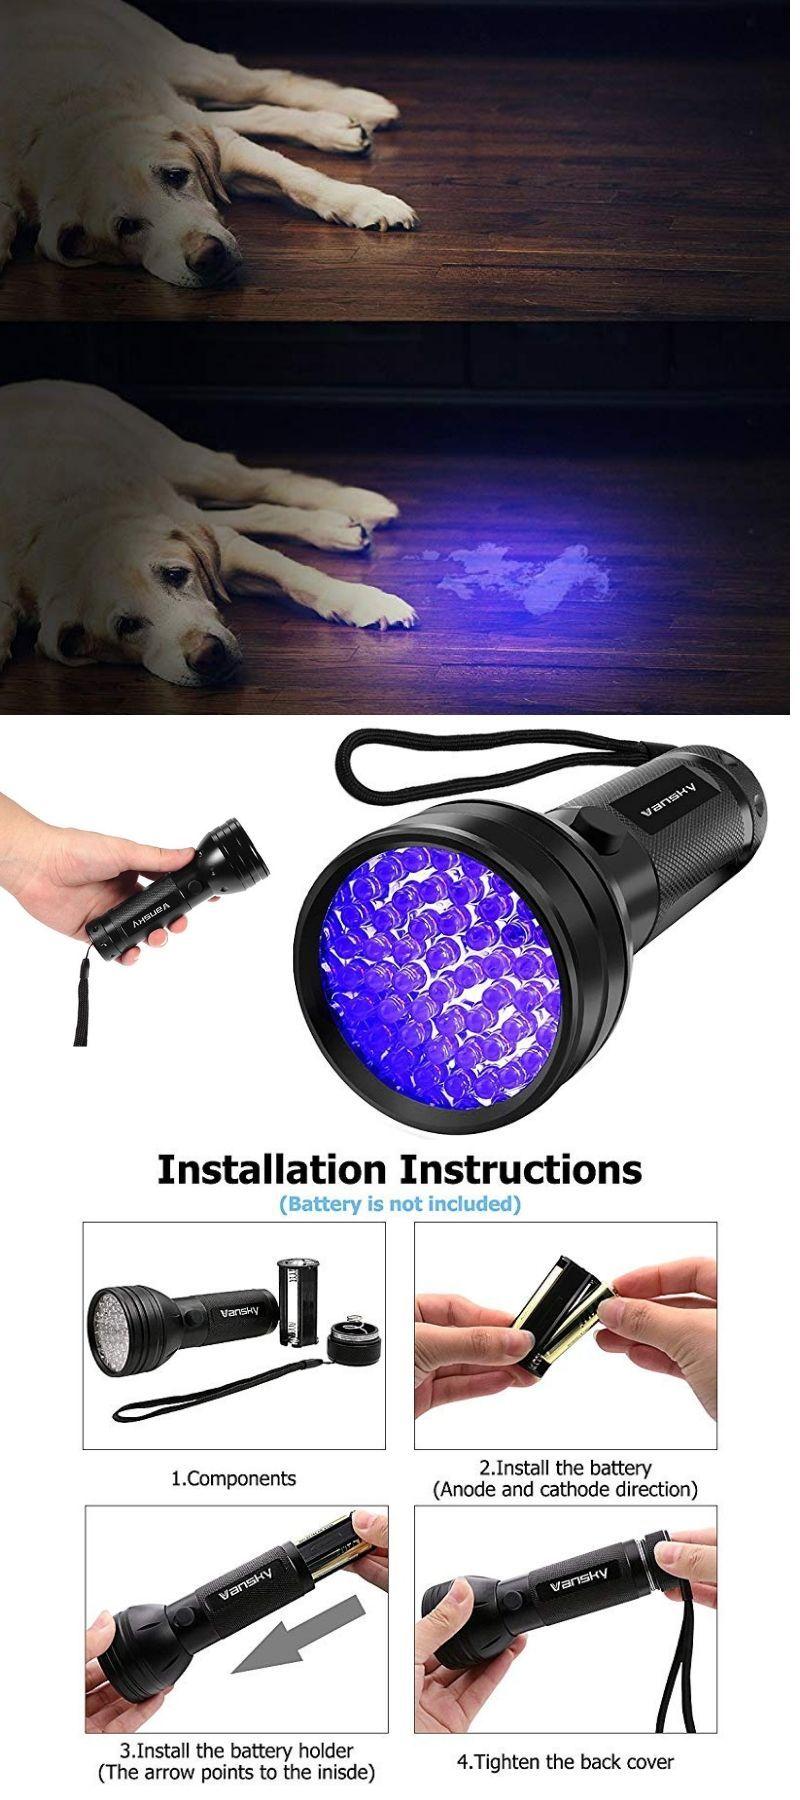 Uv Flashlight Blacklight Uv Lights Led Ultraviolet Blacklight Pet Urine Detector For Dog Cat Urine Pet Odor Eliminator Pet Odors Pets